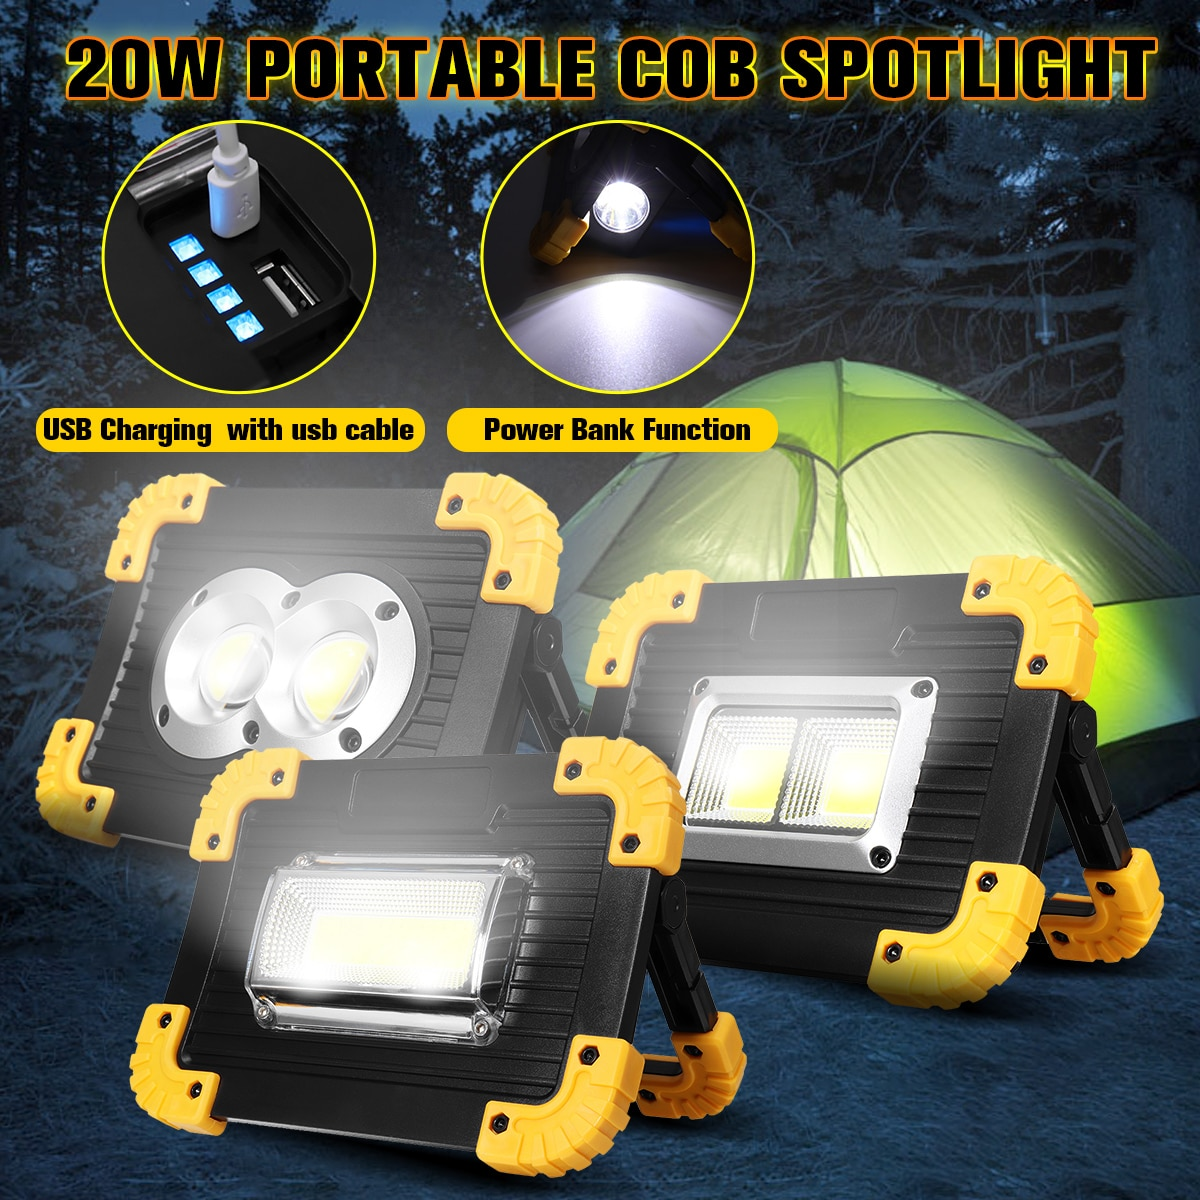 20 W proyector portátil COB LED luz de trabajo reflector 18650 USB recargable al aire libre punto de luz banco de energía para Camping caza